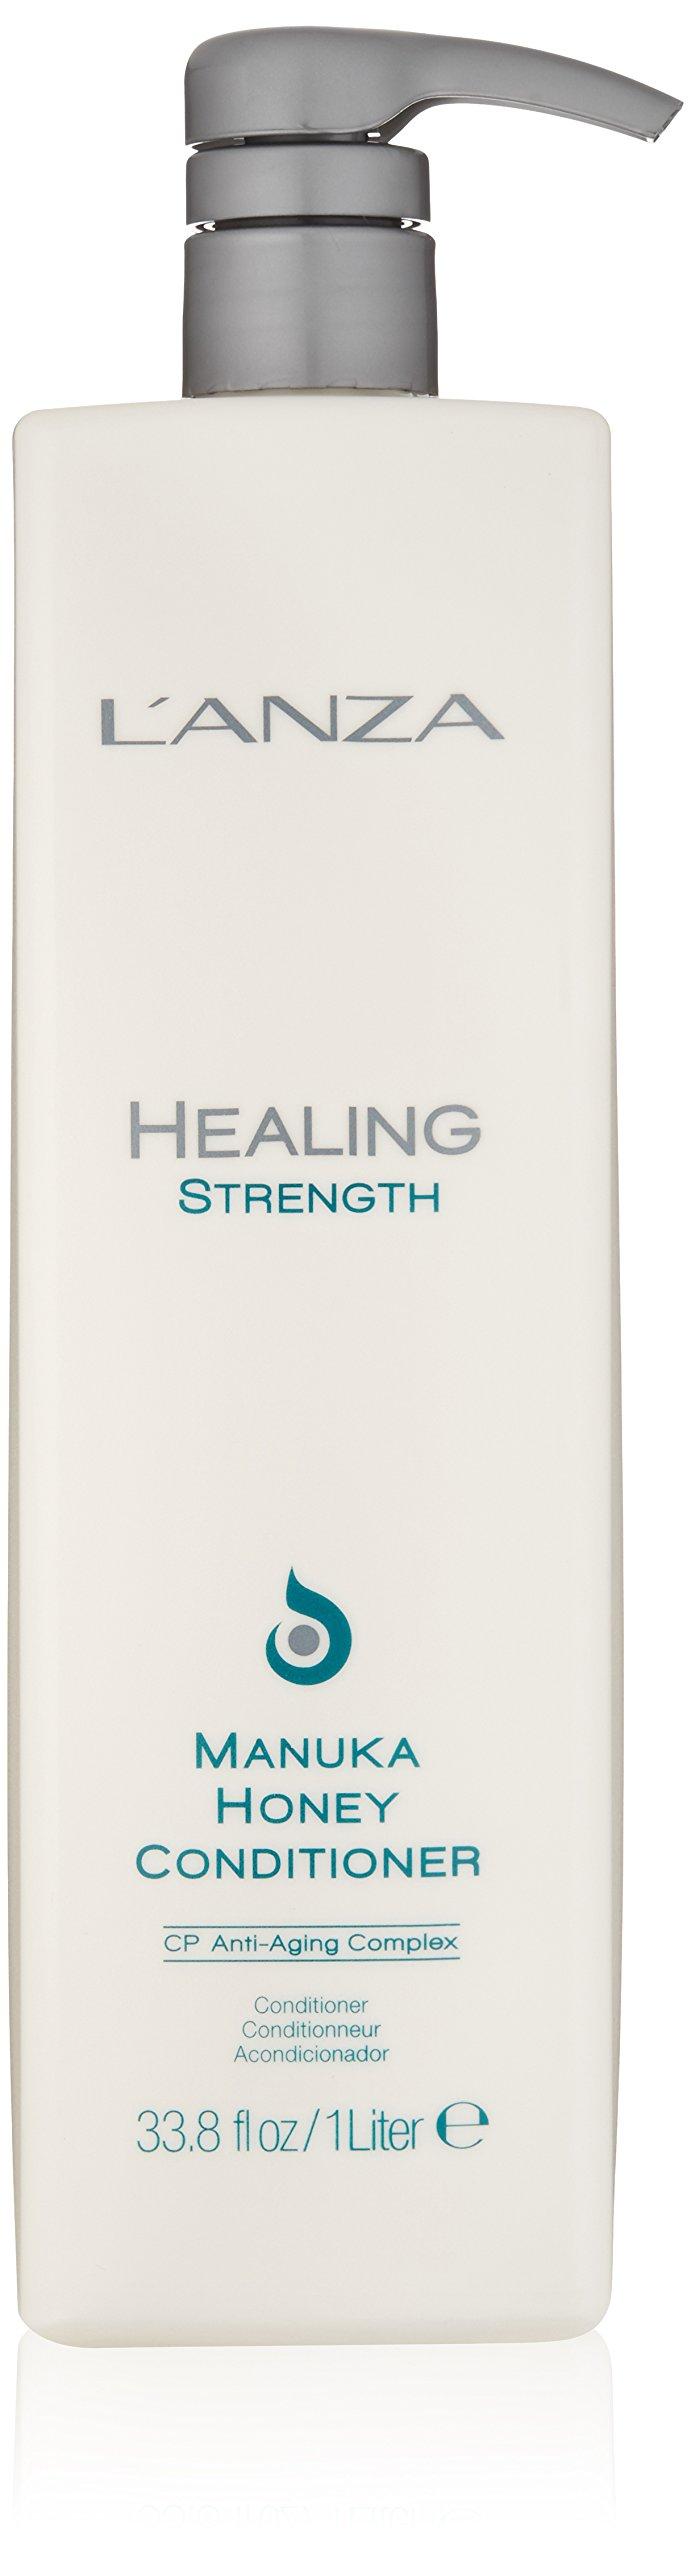 L'ANZA Healing Strength Manuka Honey Conditioner, 33.8 oz.